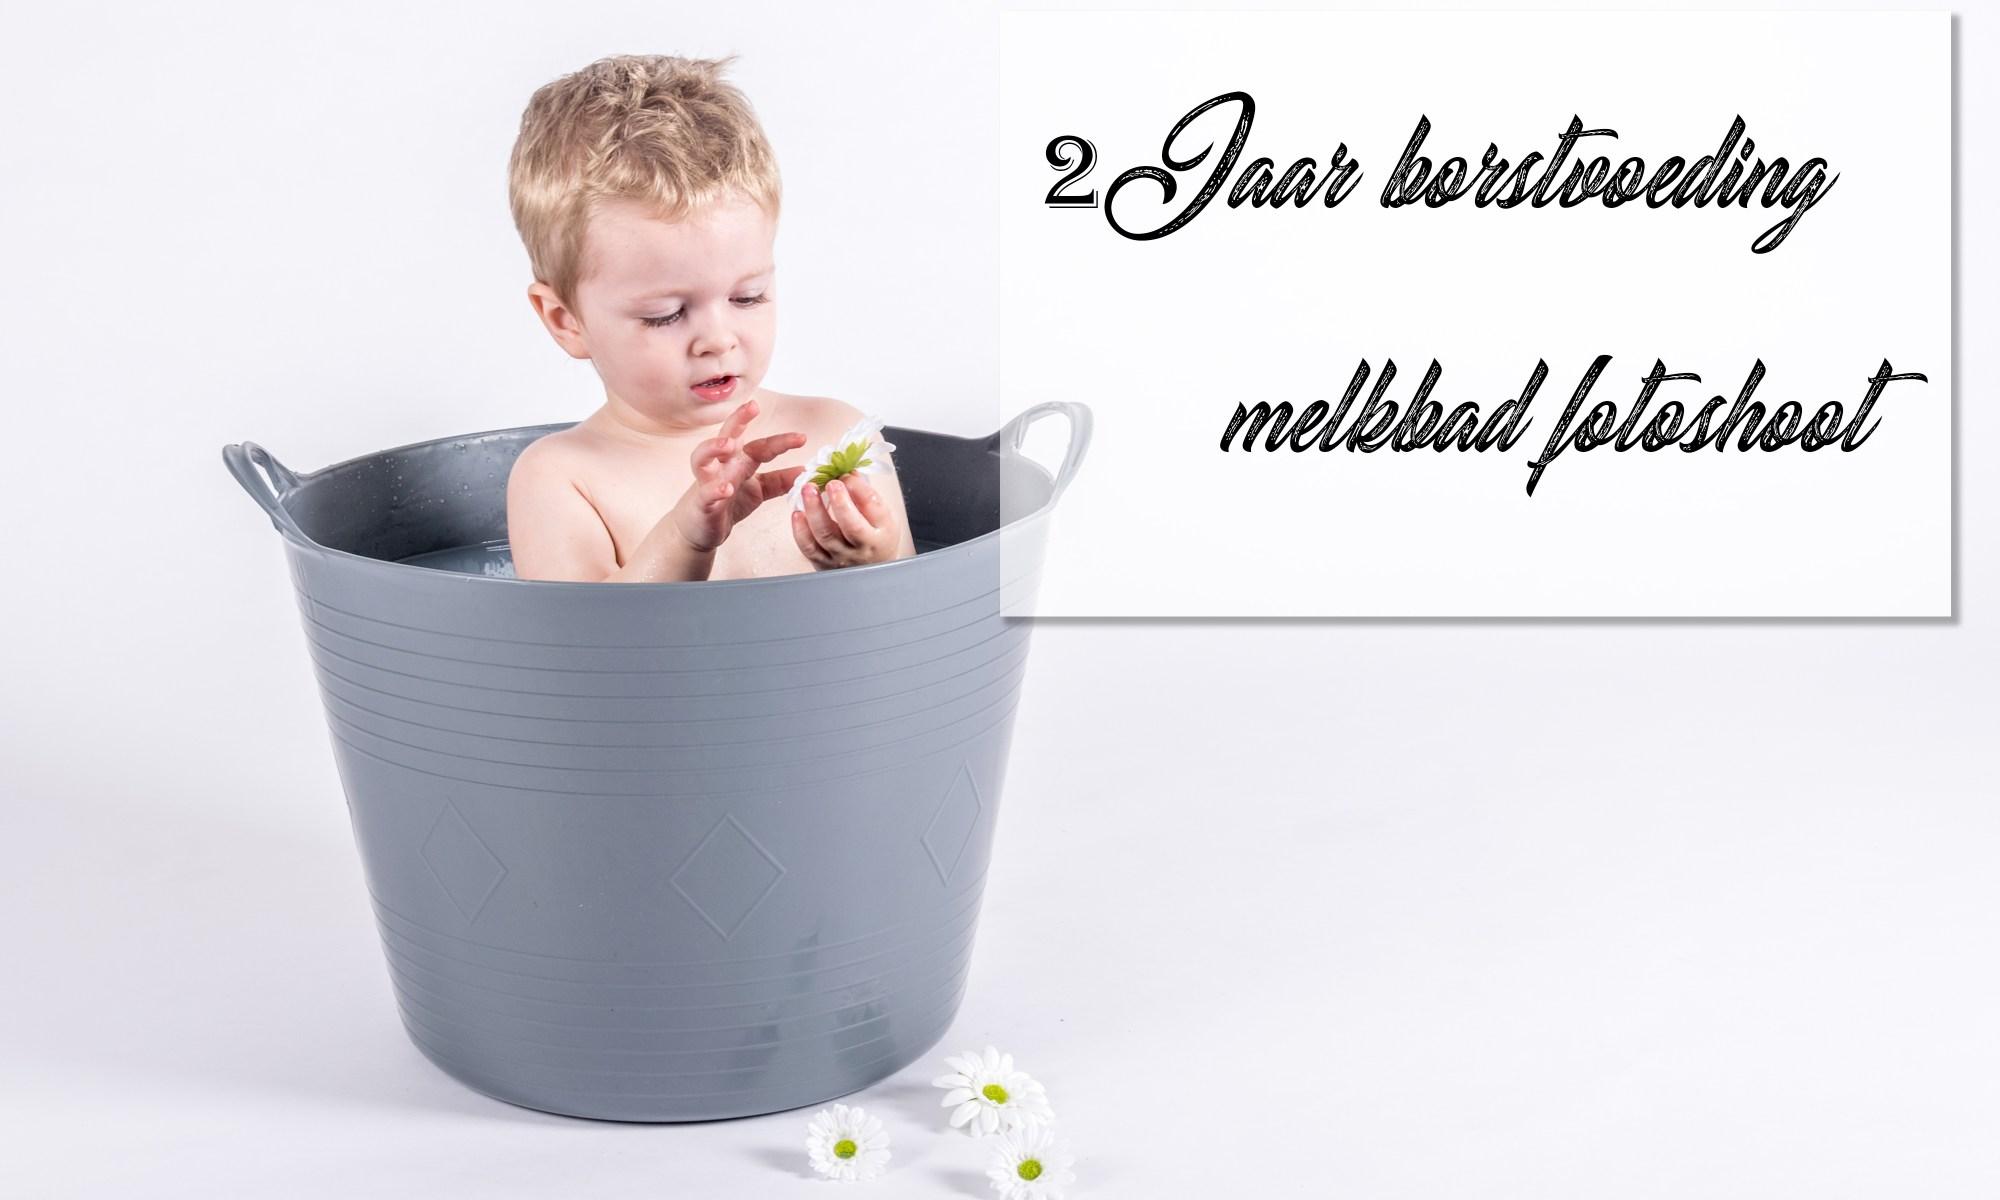 mamablog fotoshoot fotograag fotografie baby peuter melkbad 2 jaar borstvoeding